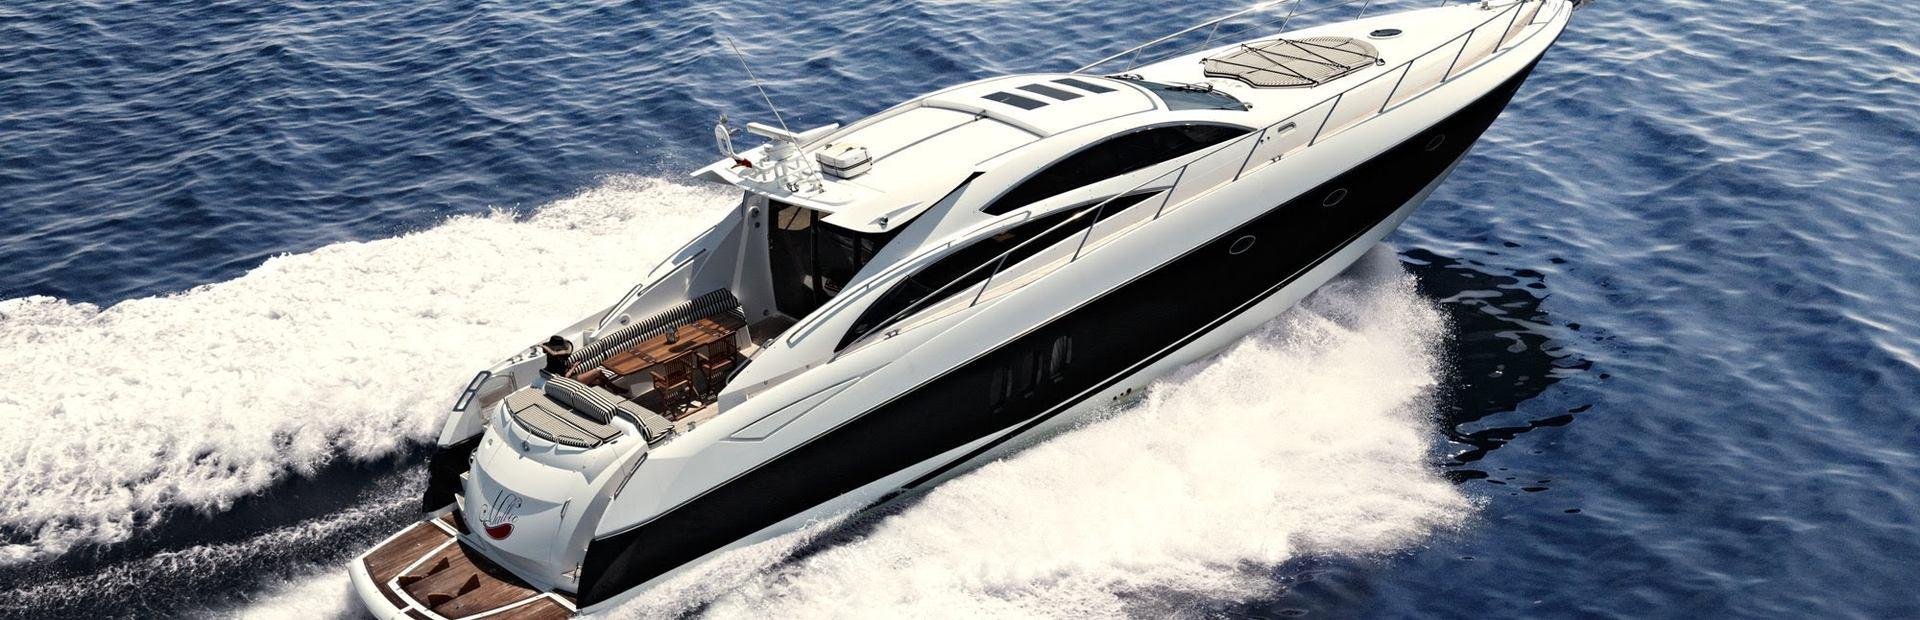 Predator 82 Yacht Charter